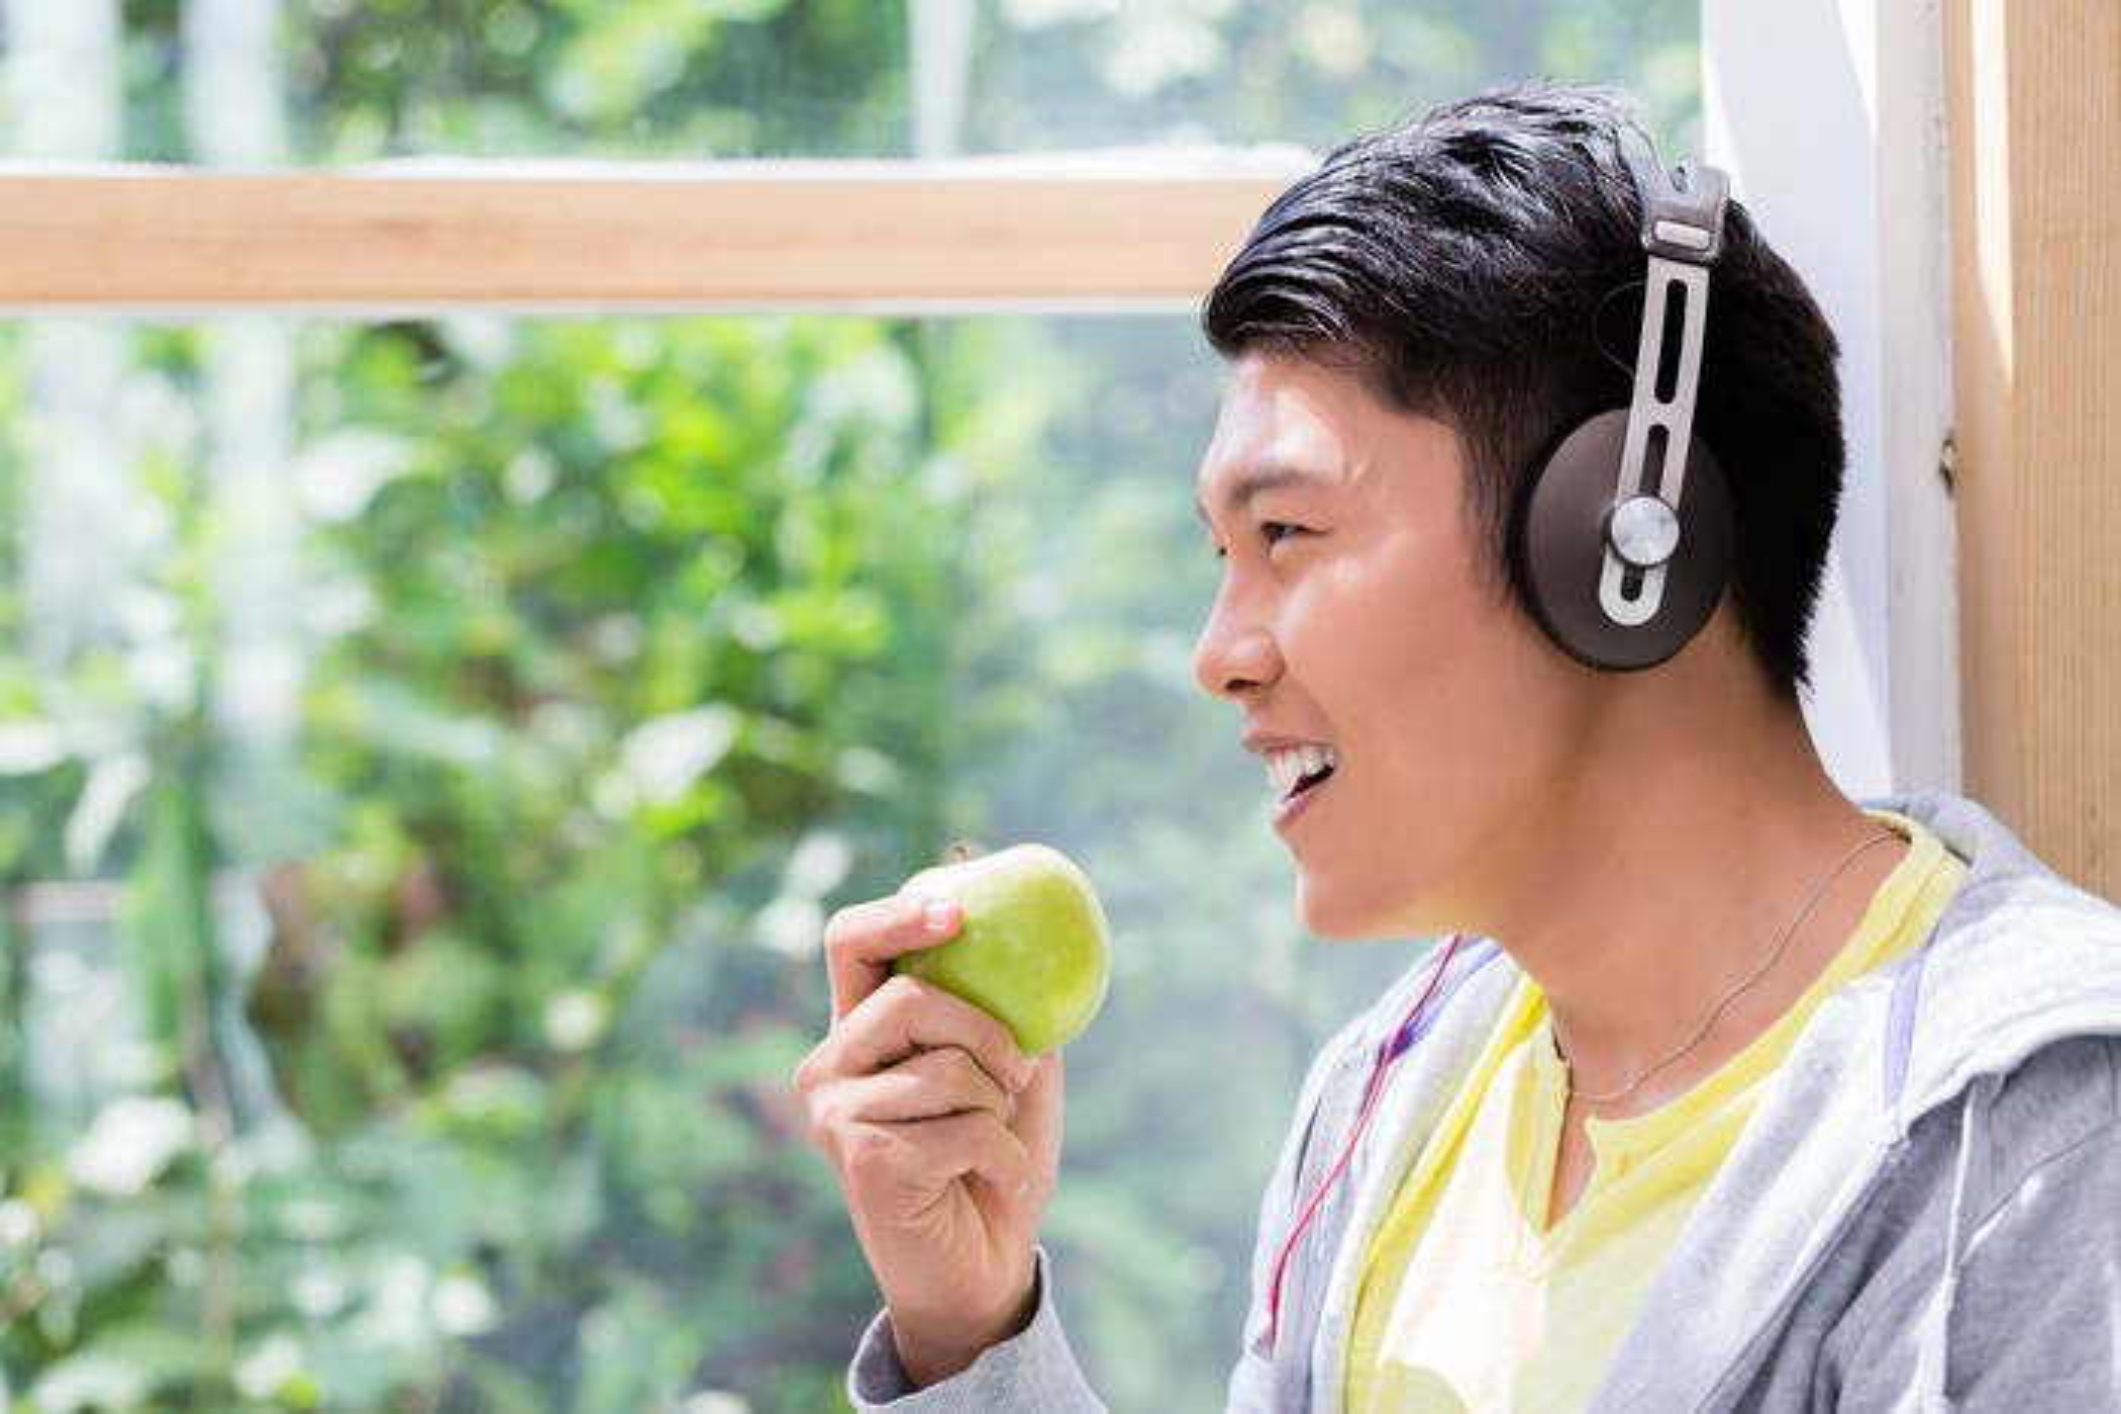 A man wears headphones while eating an apple.